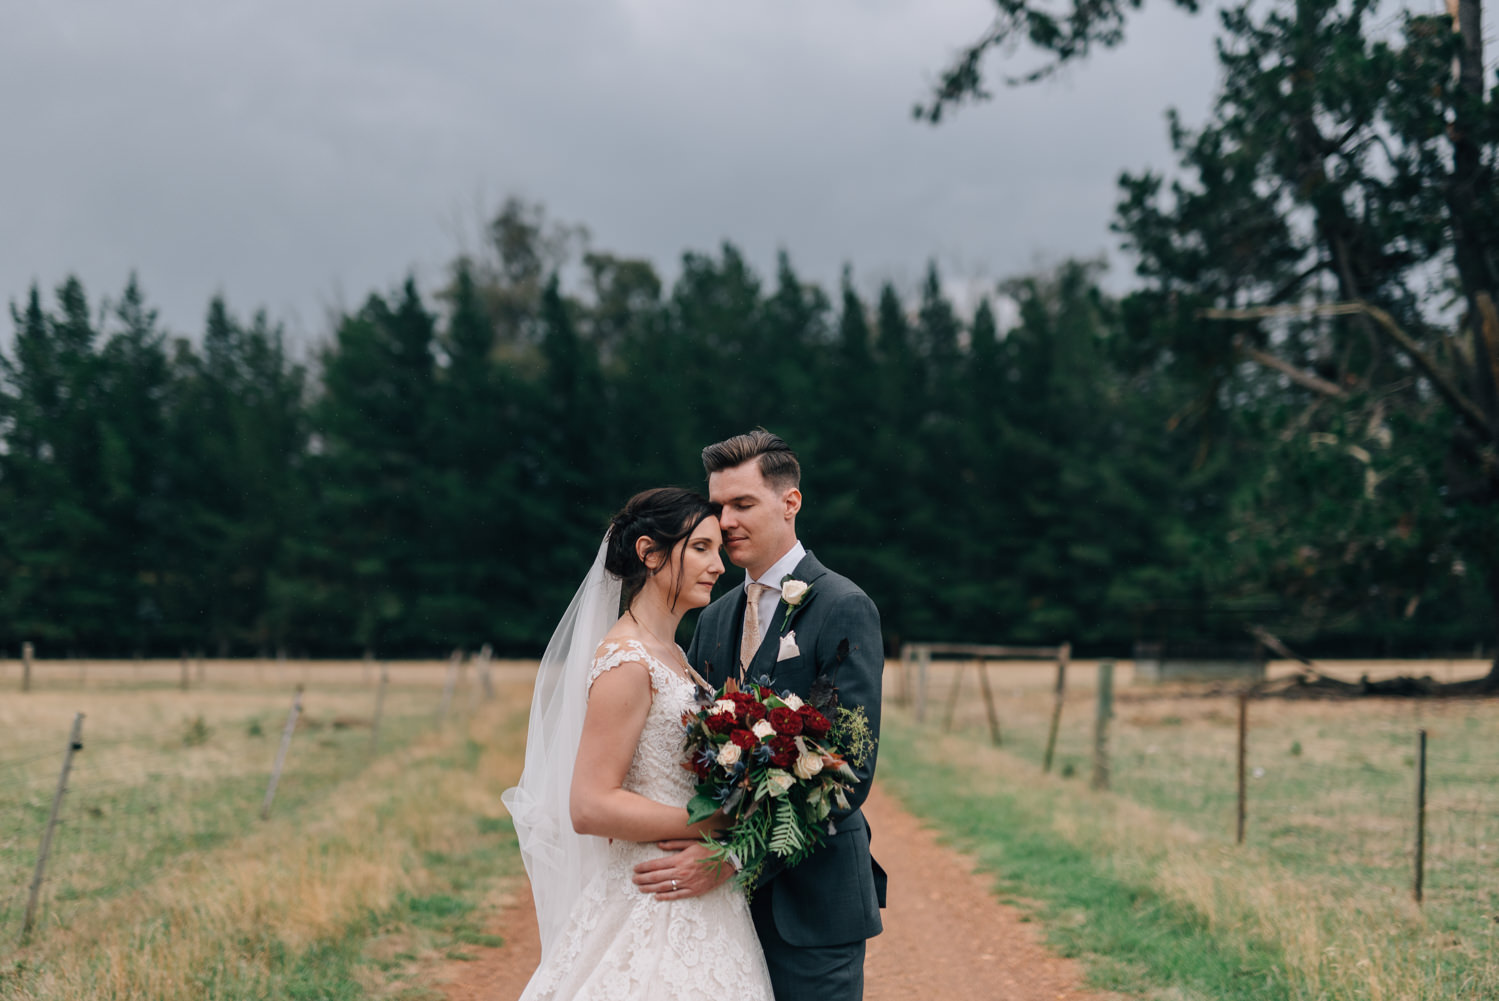 Brickendon-Wedding-Photographer-108.jpg